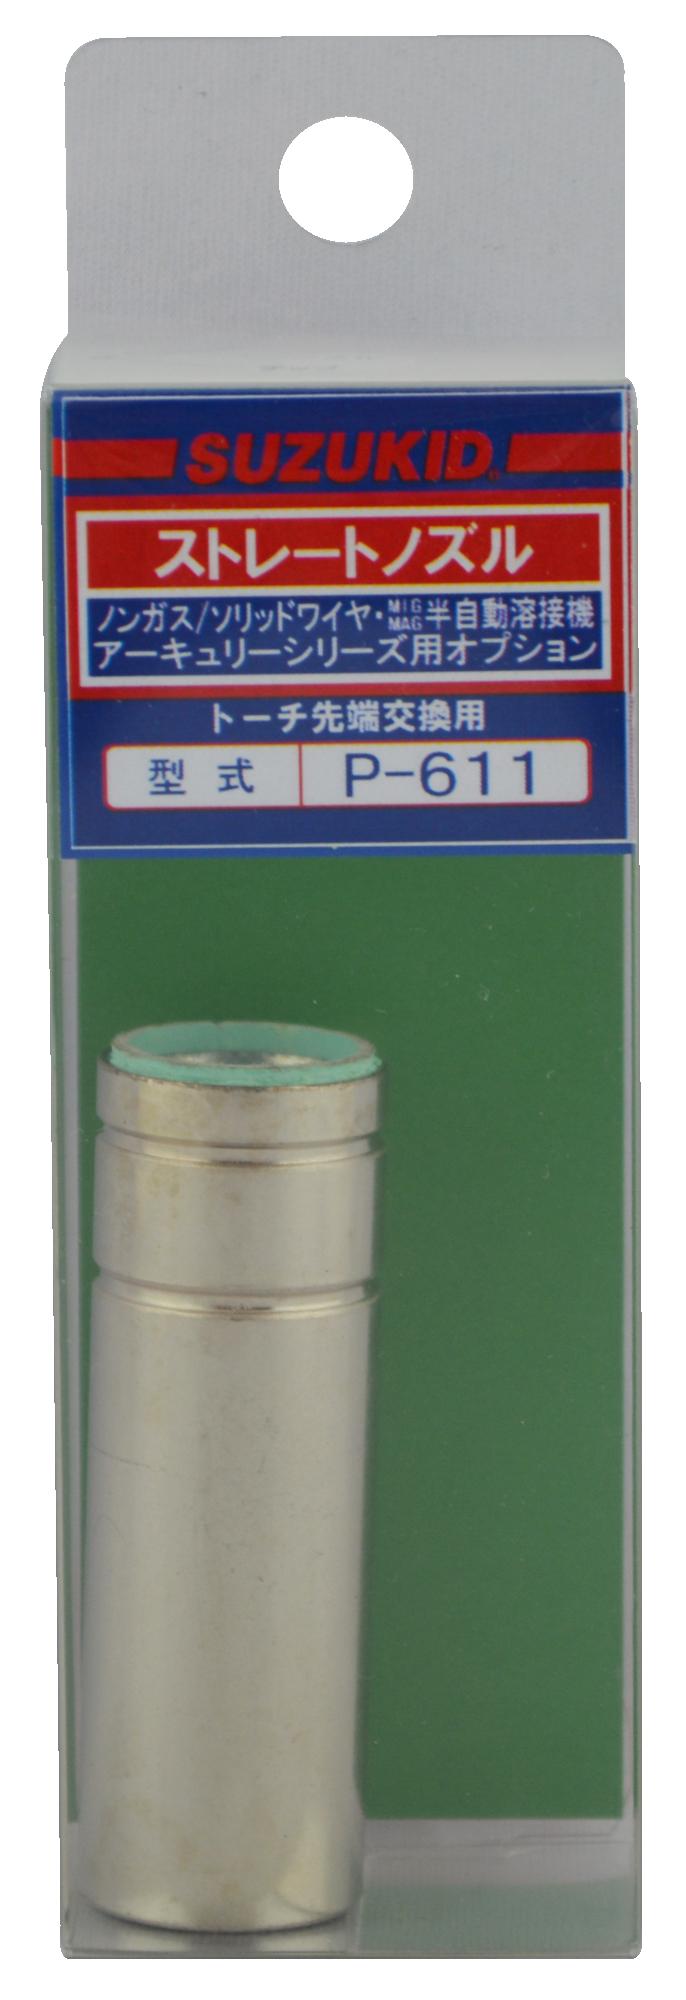 P-611